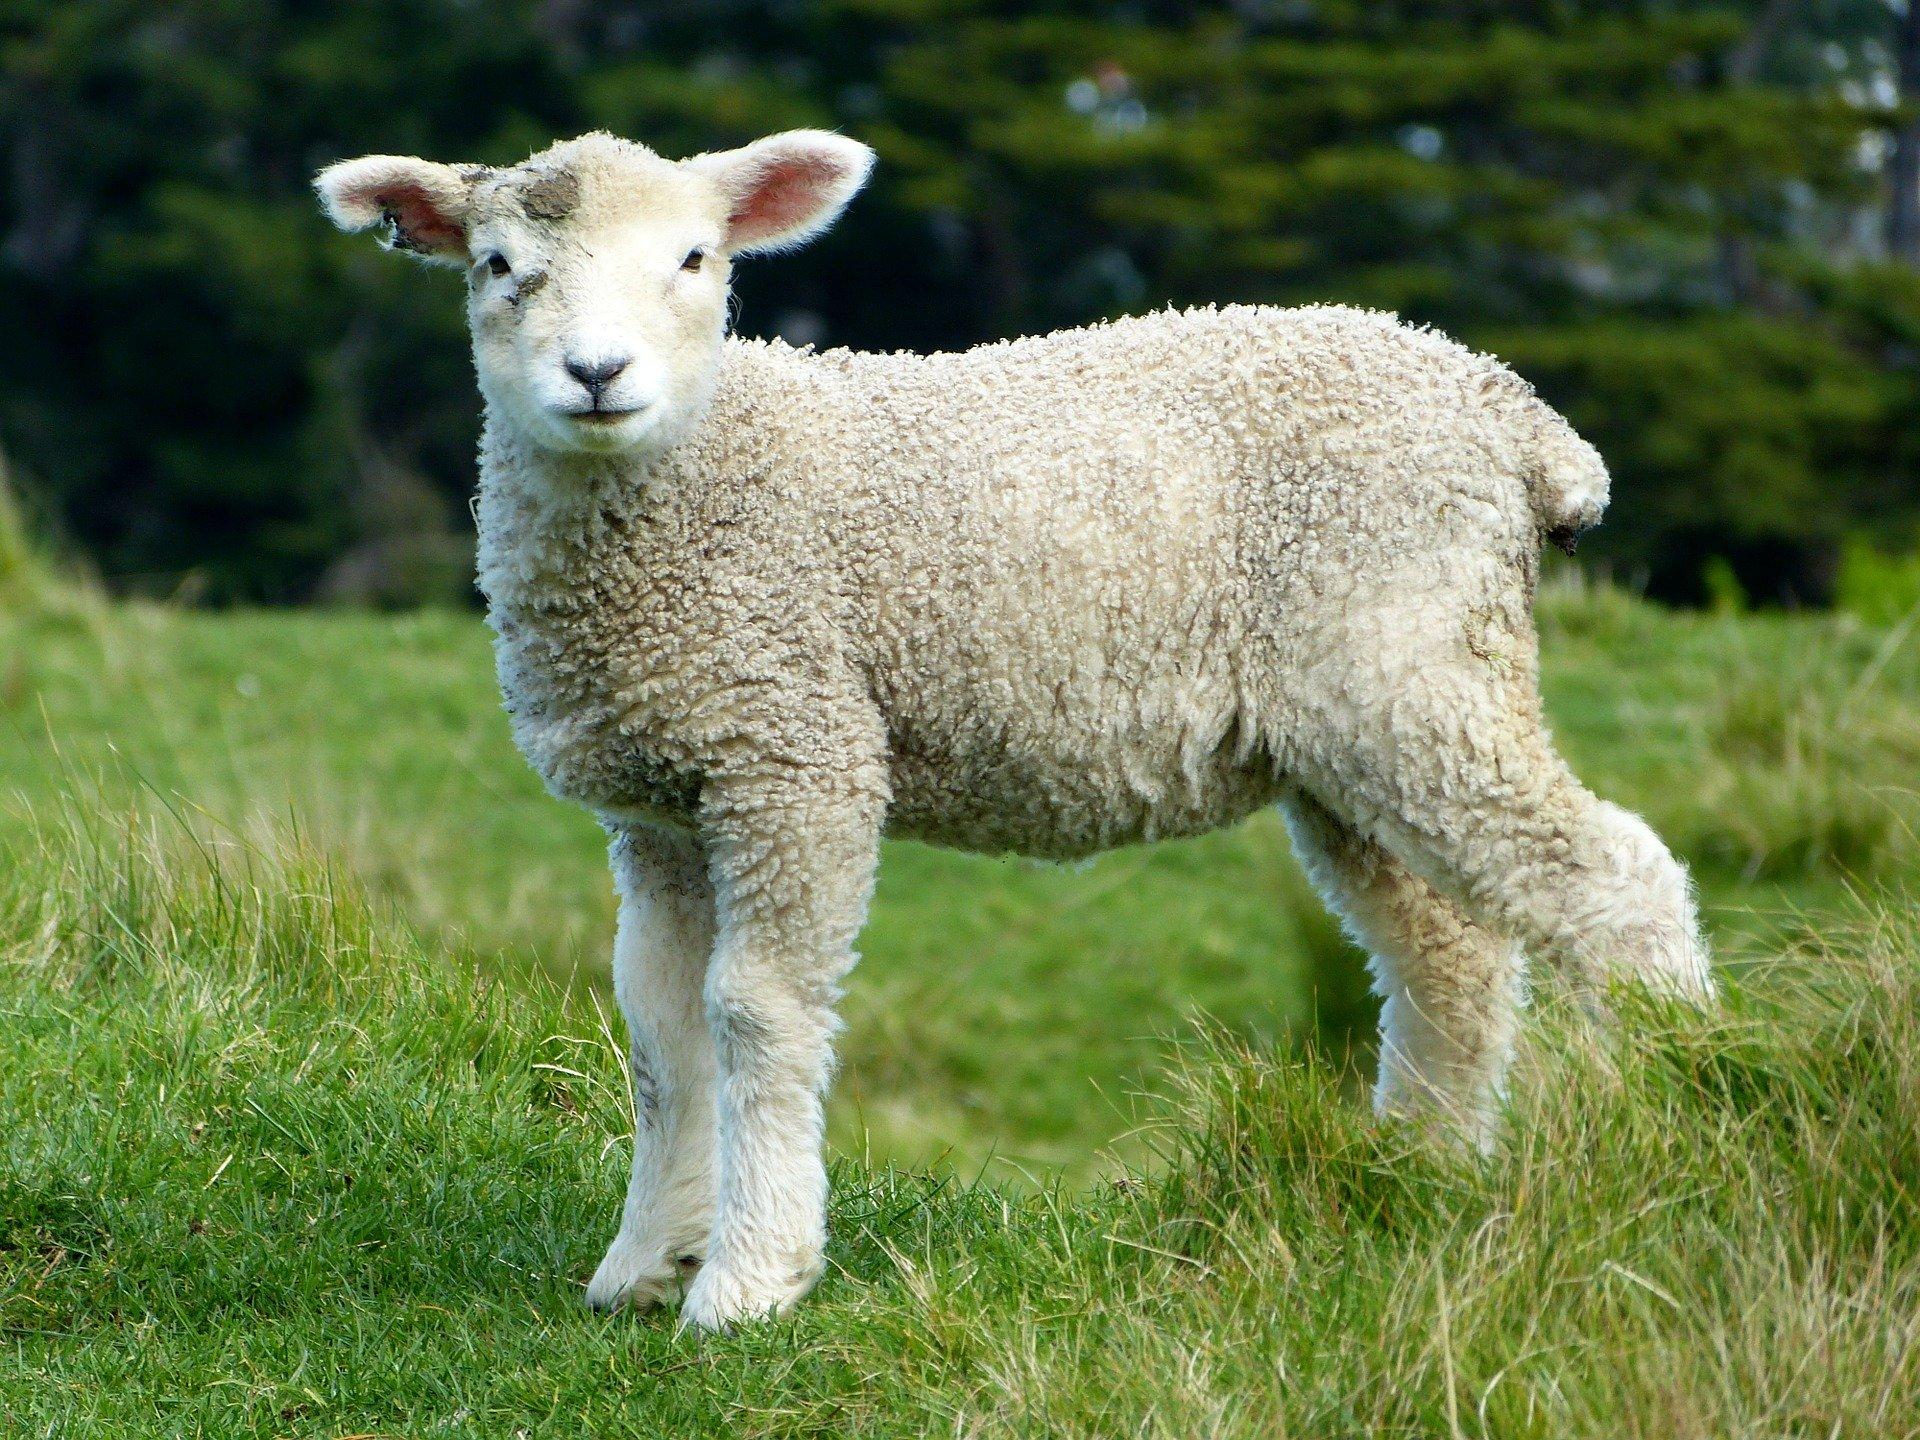 Under the Good Shepherd